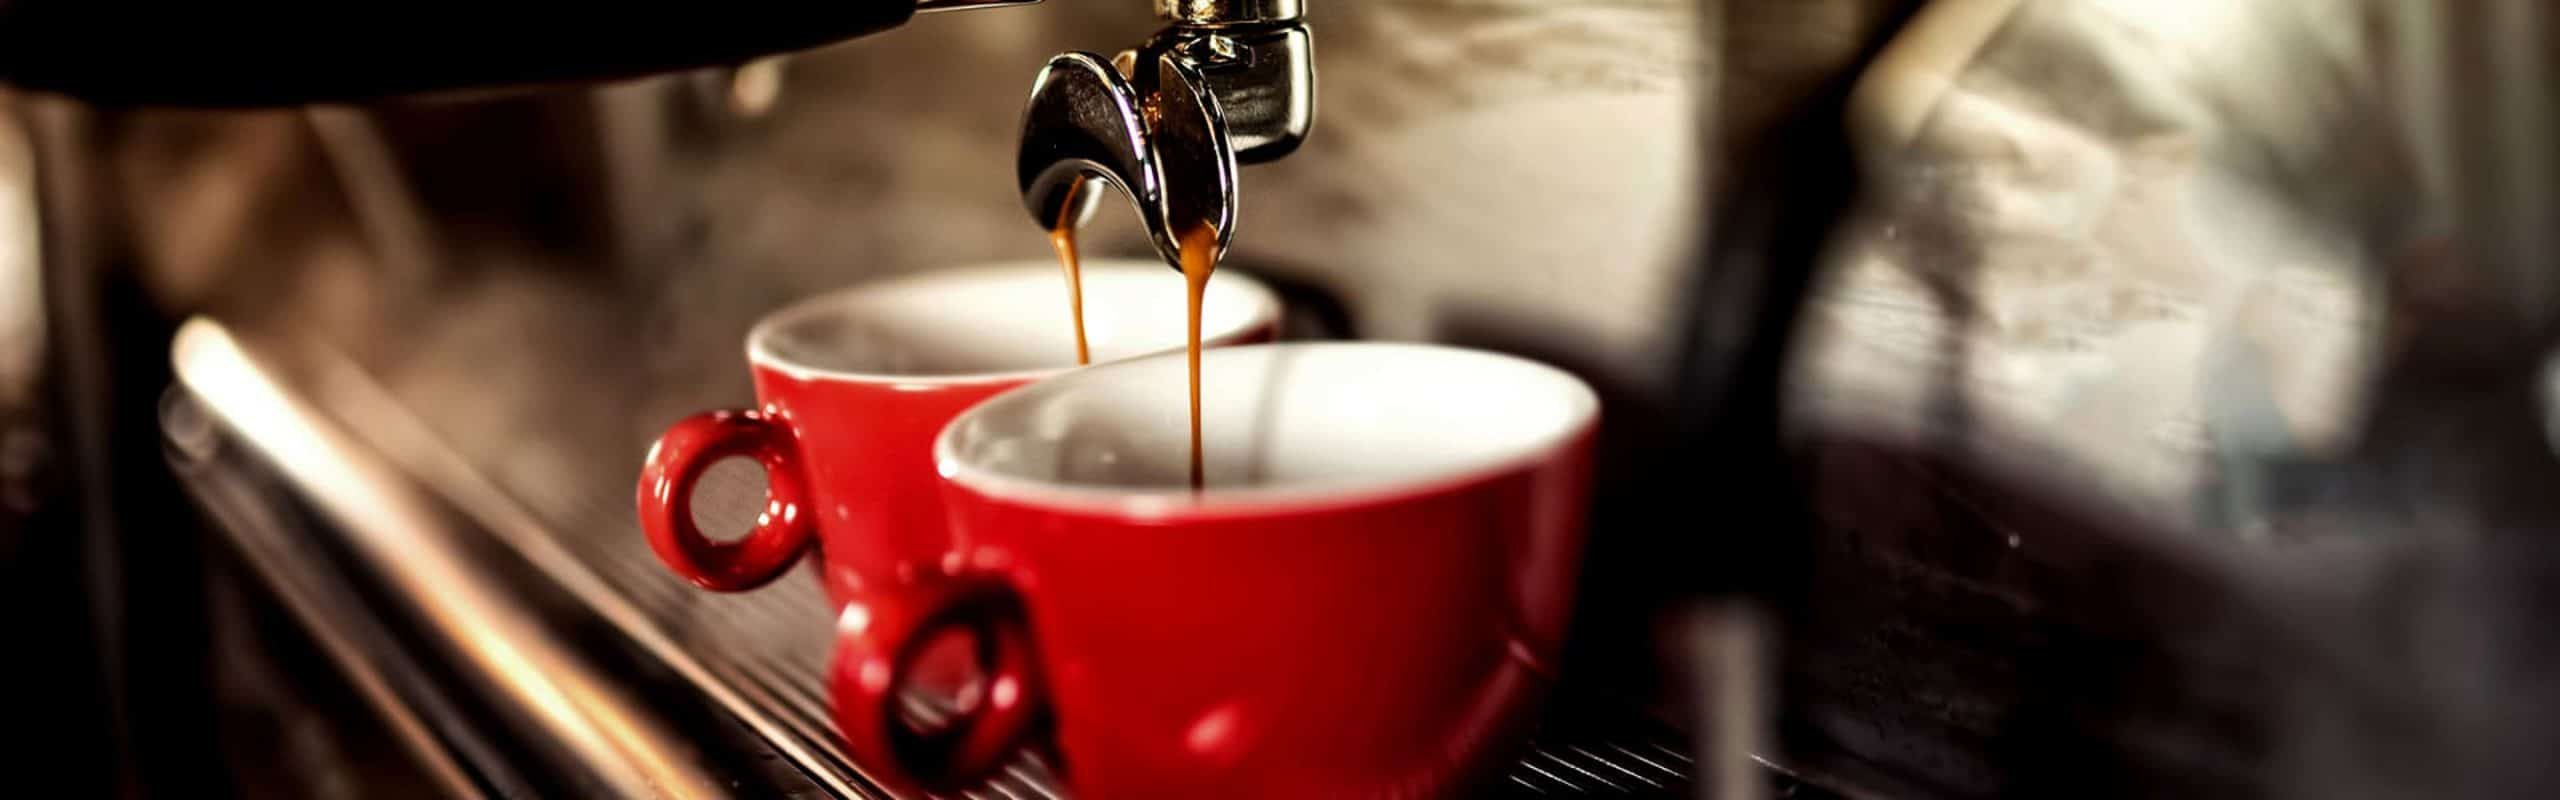 Nescafe Online